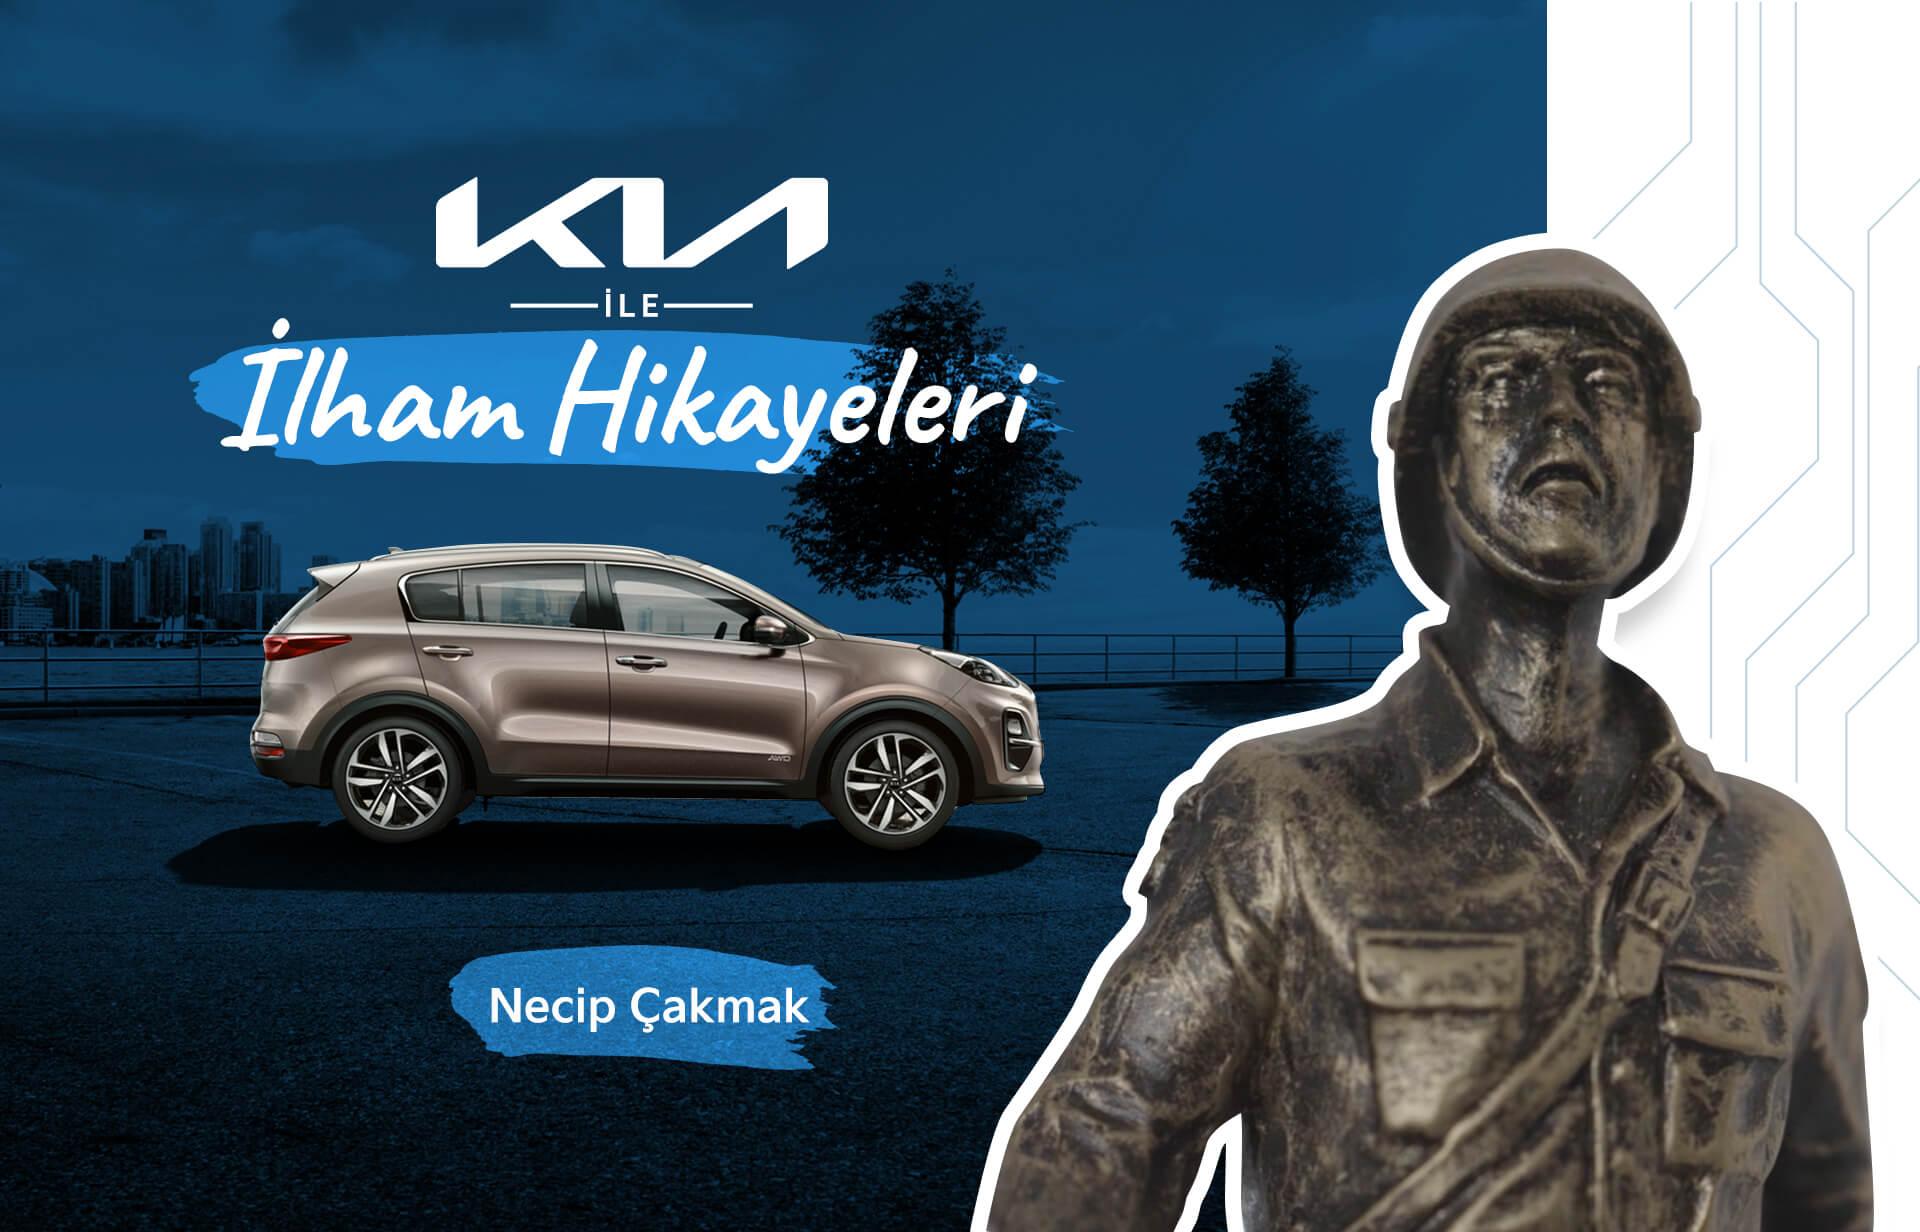 Kia_NecipCakmak_1920x1232